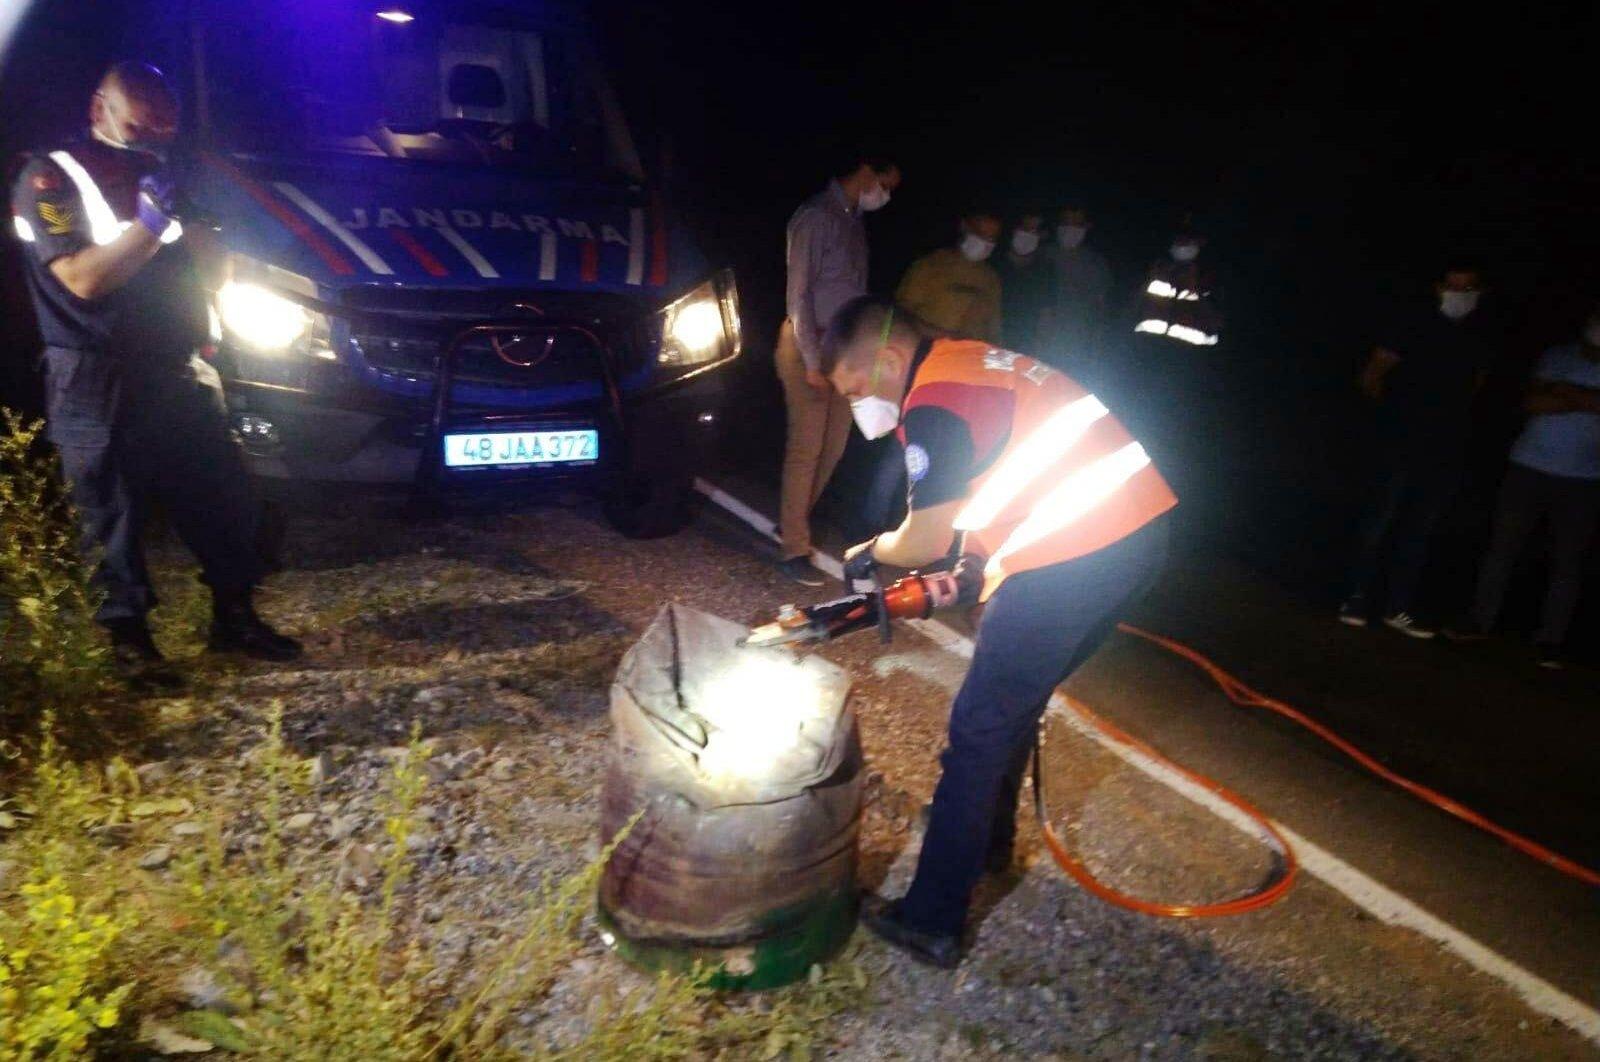 Gendarmerie officers open the barrel containing the body, in Muğla, southwestern Turkey, July 21, 2020. (DHA Photo)